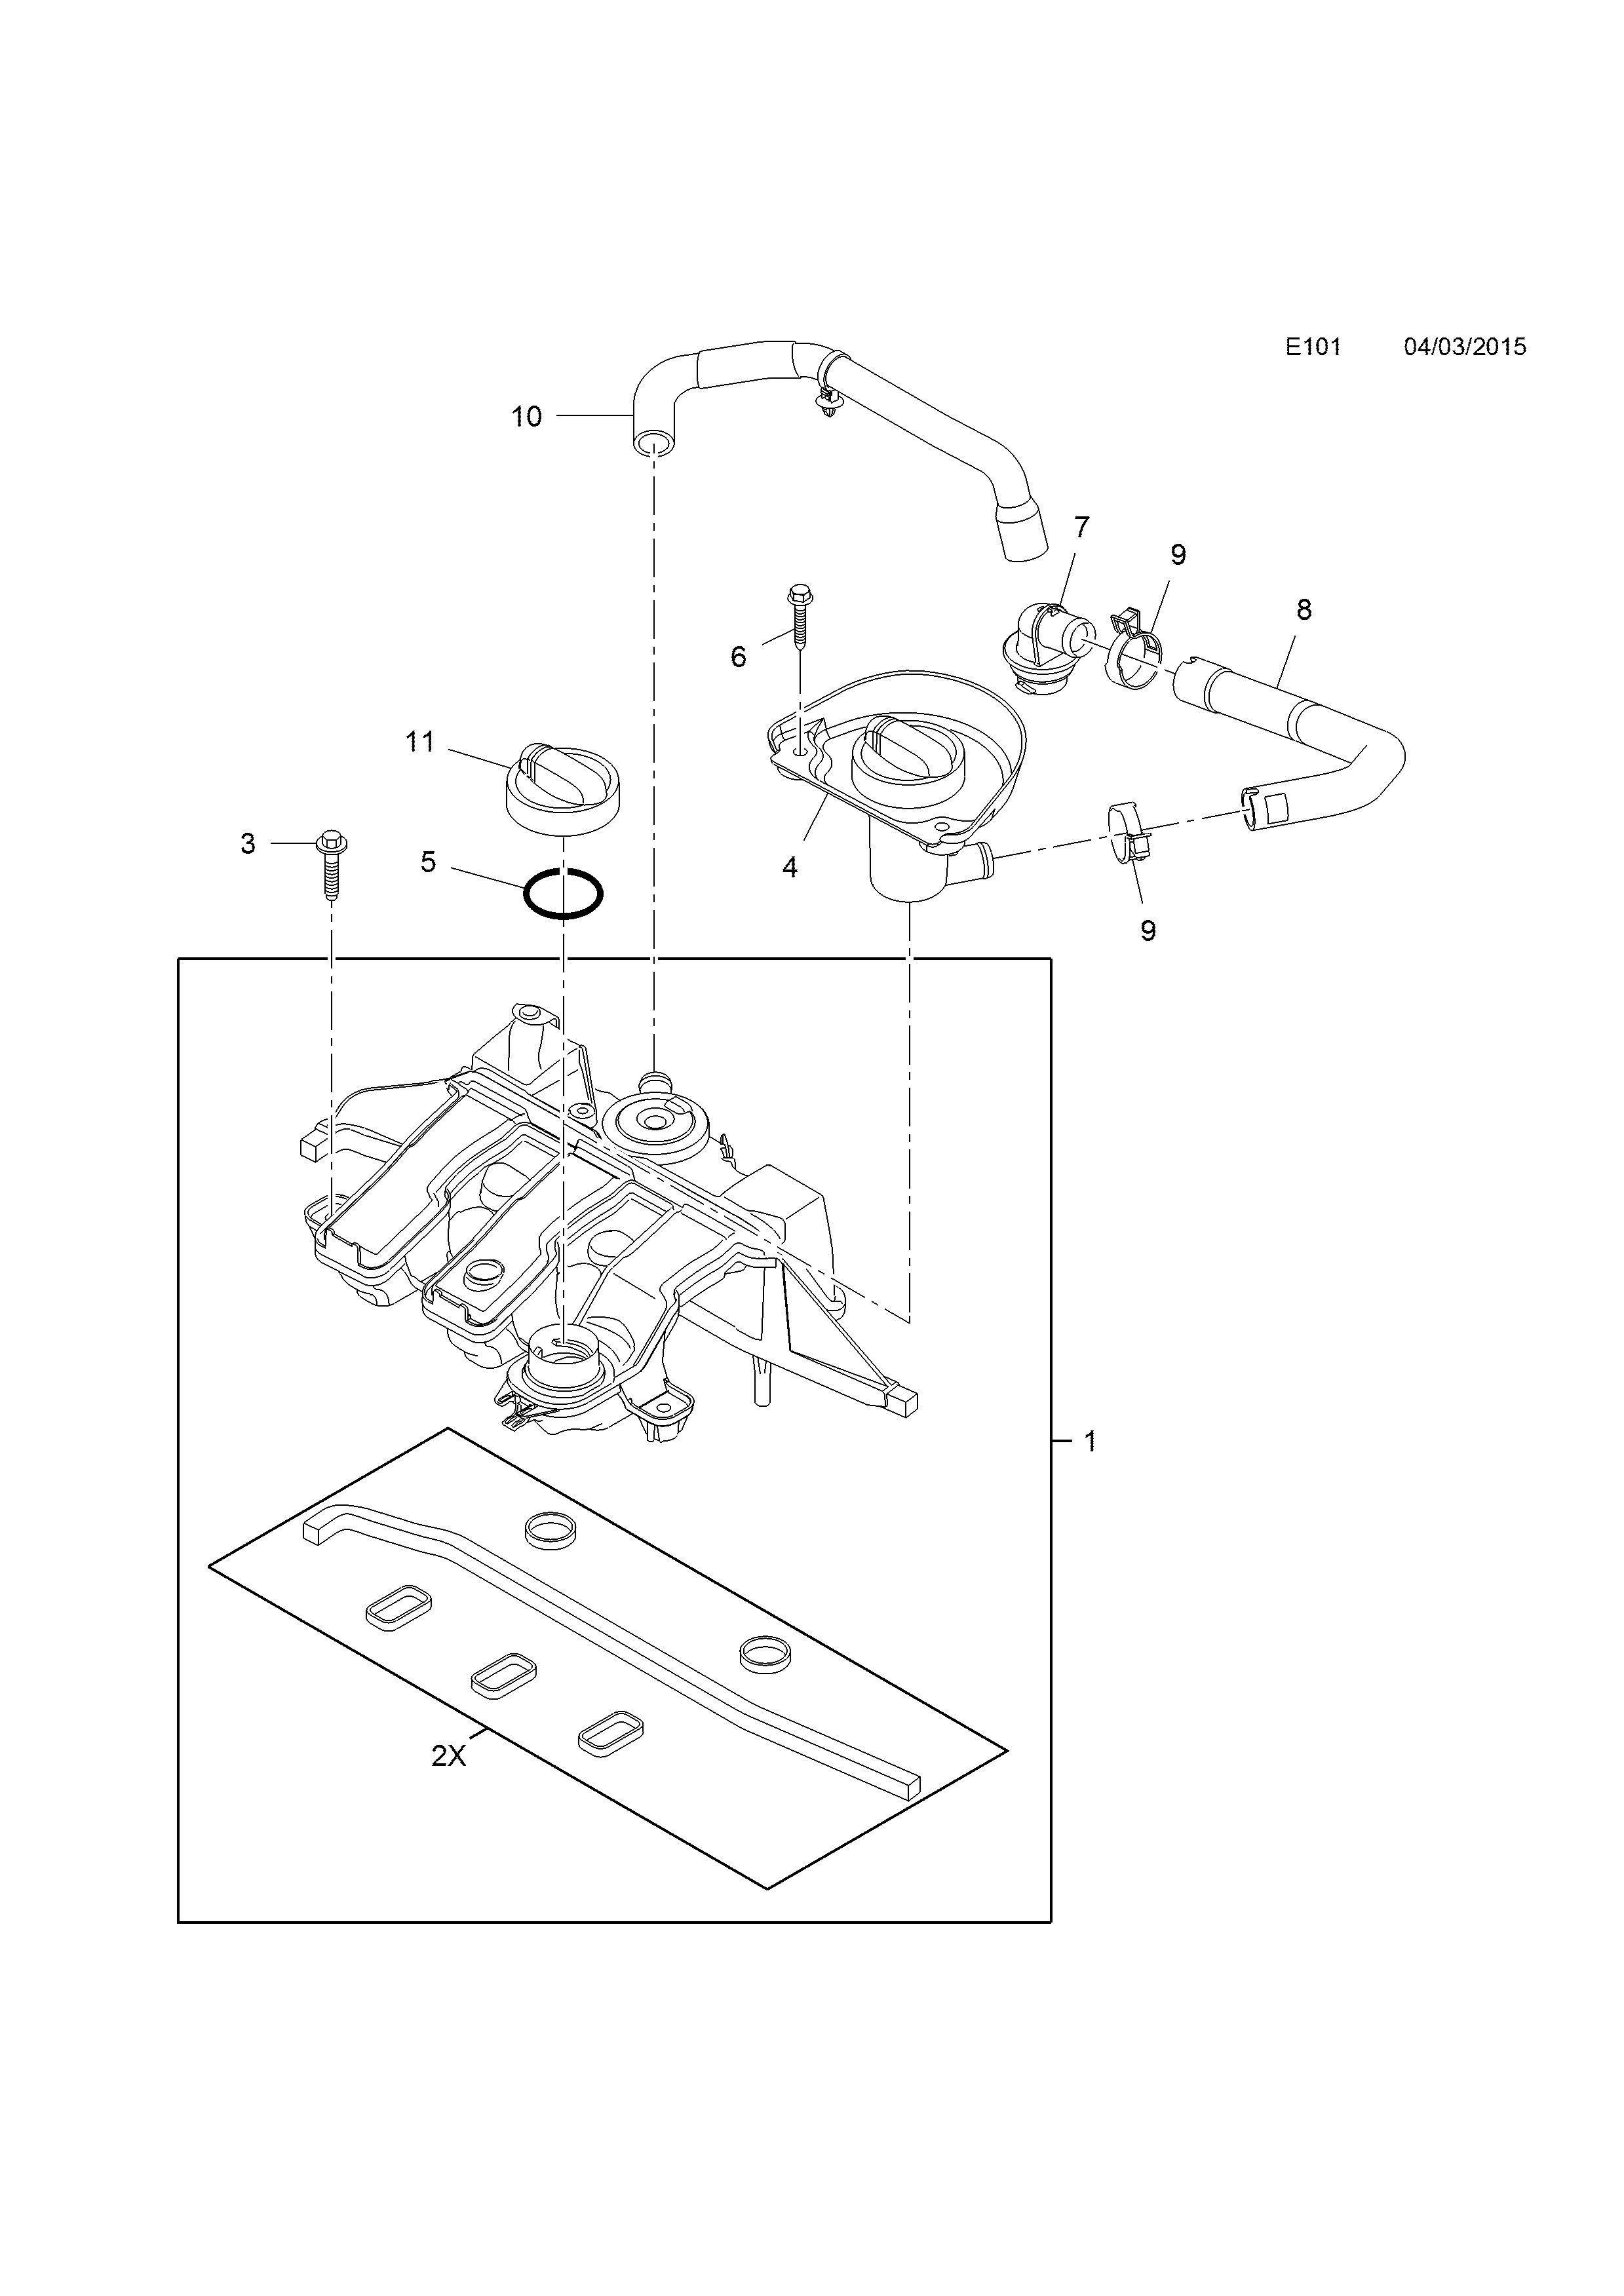 opel vivaro b 2015 e engine and clutch 1 16d r9m ma mb mc 2015 Opel GT Interior list of parts